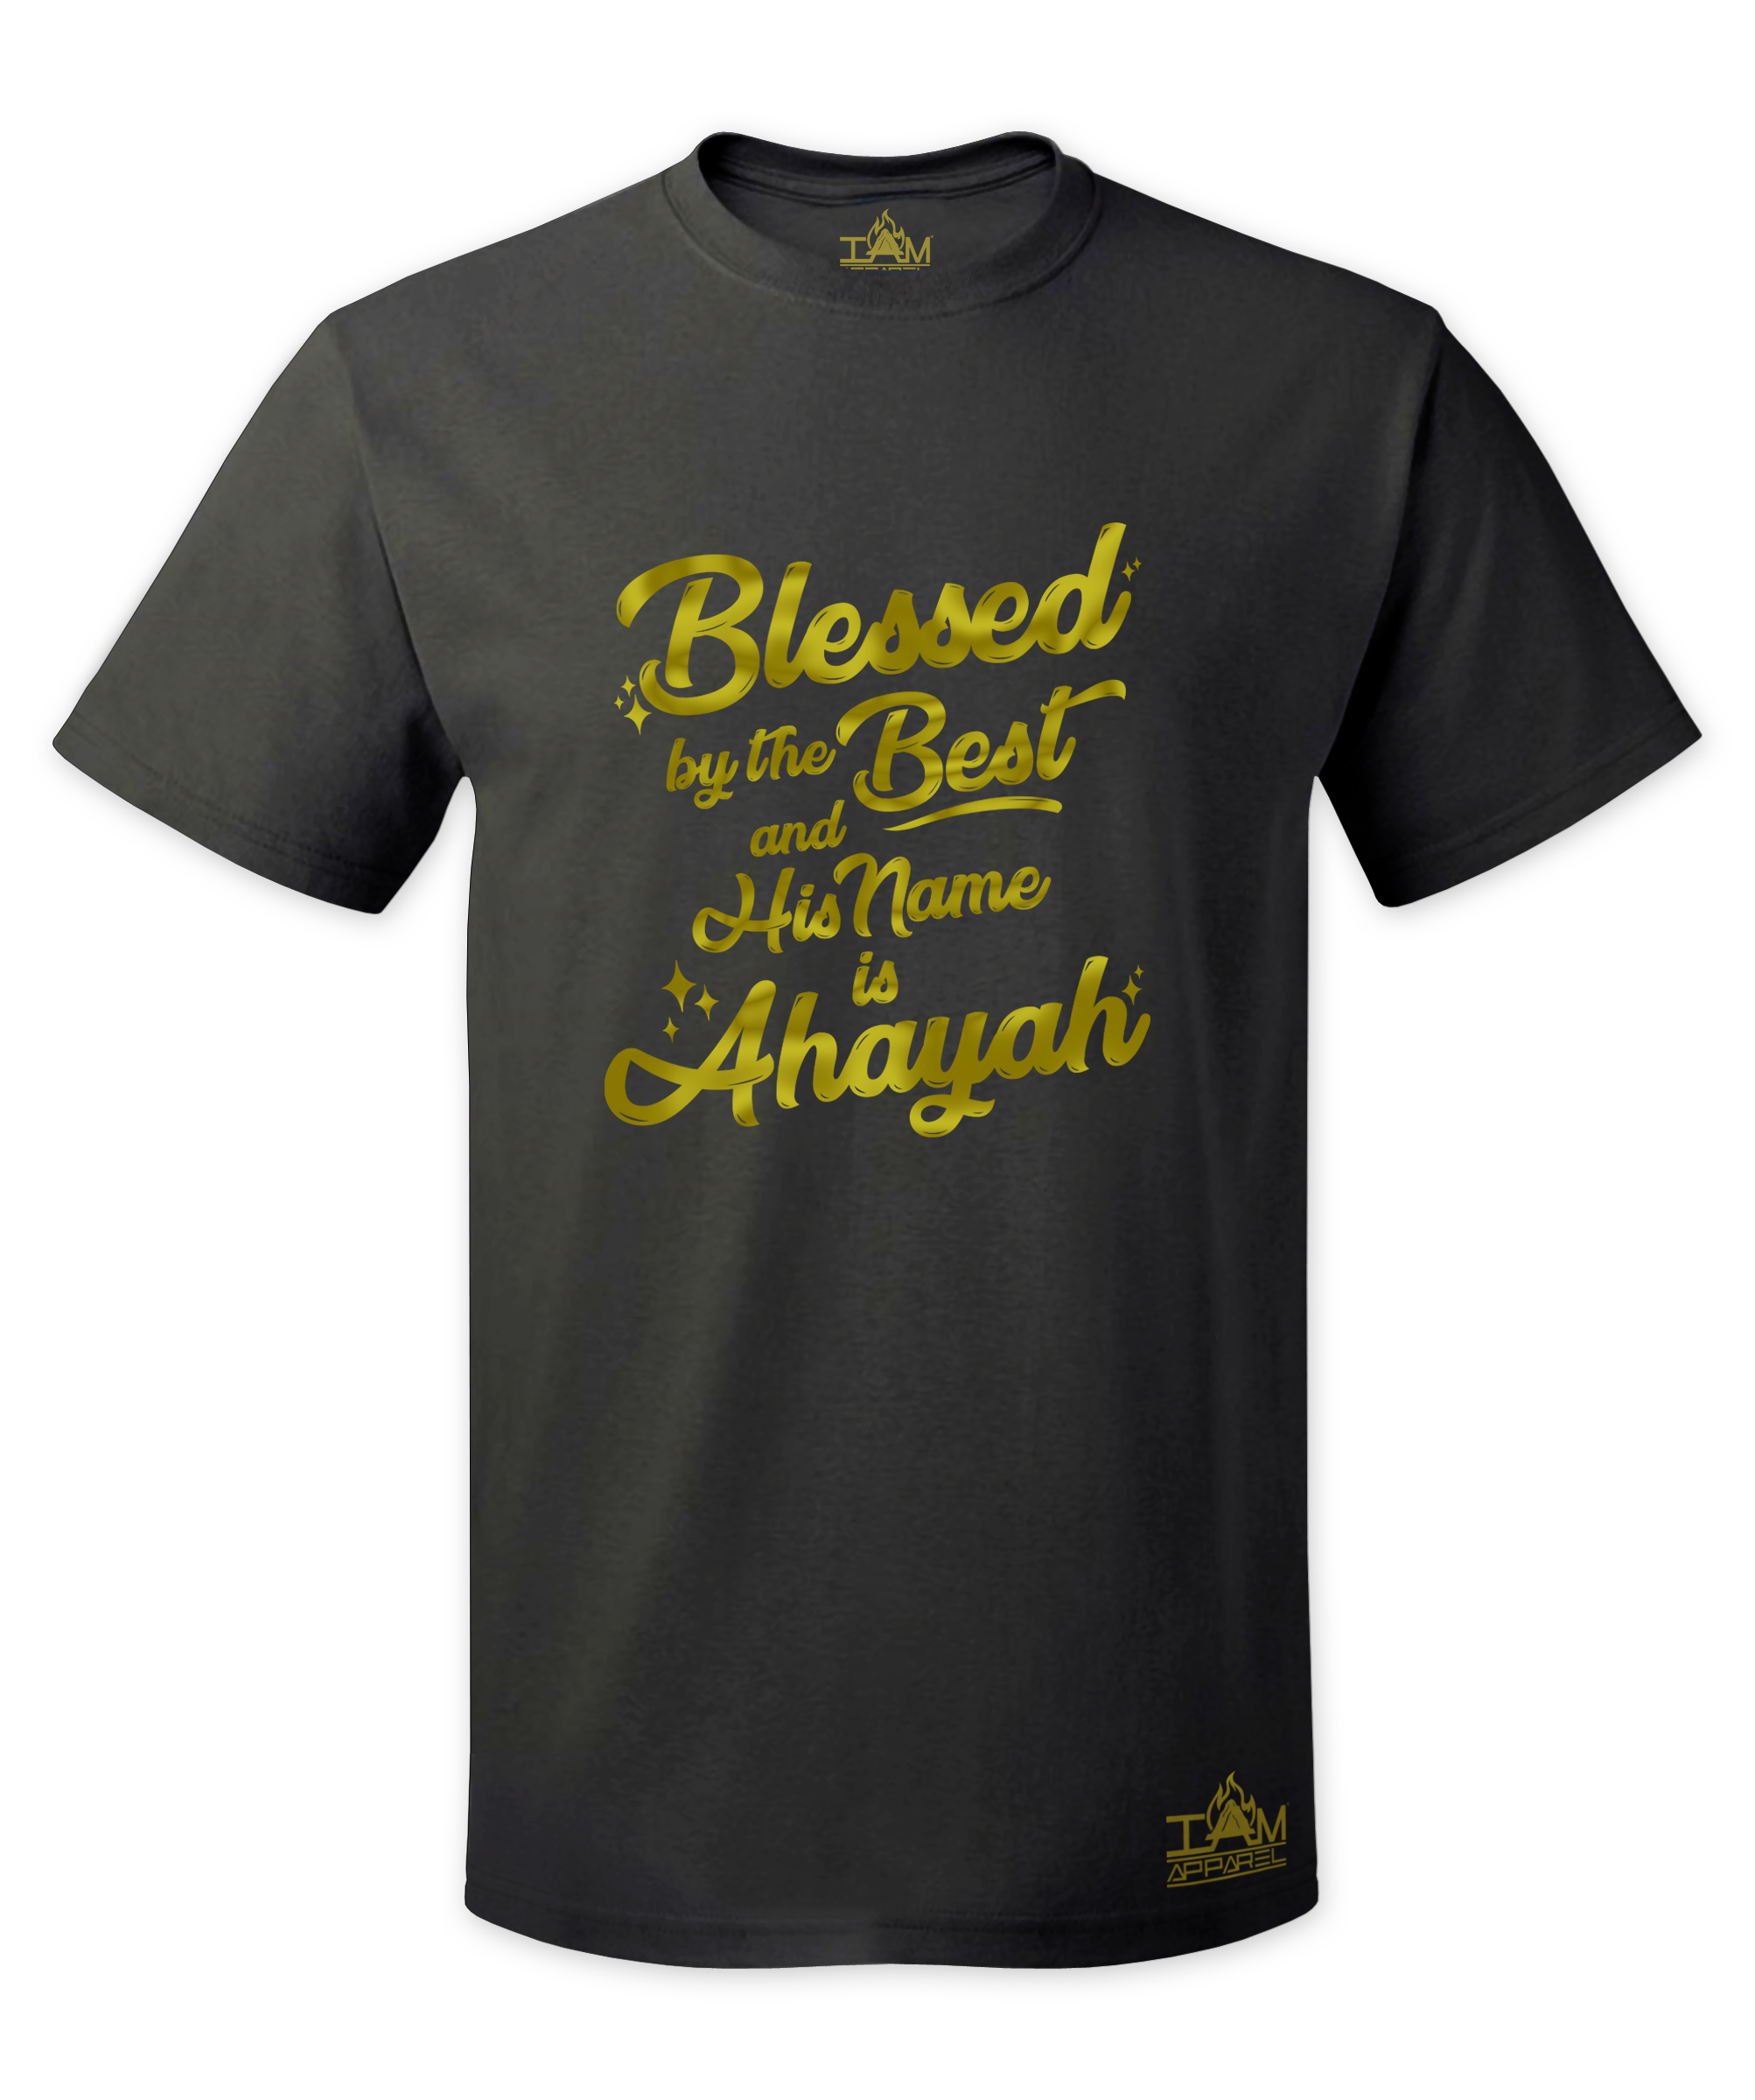 Men's GOLDEN SERIES Blessed by the best Short Sleeved T-shirt 00124